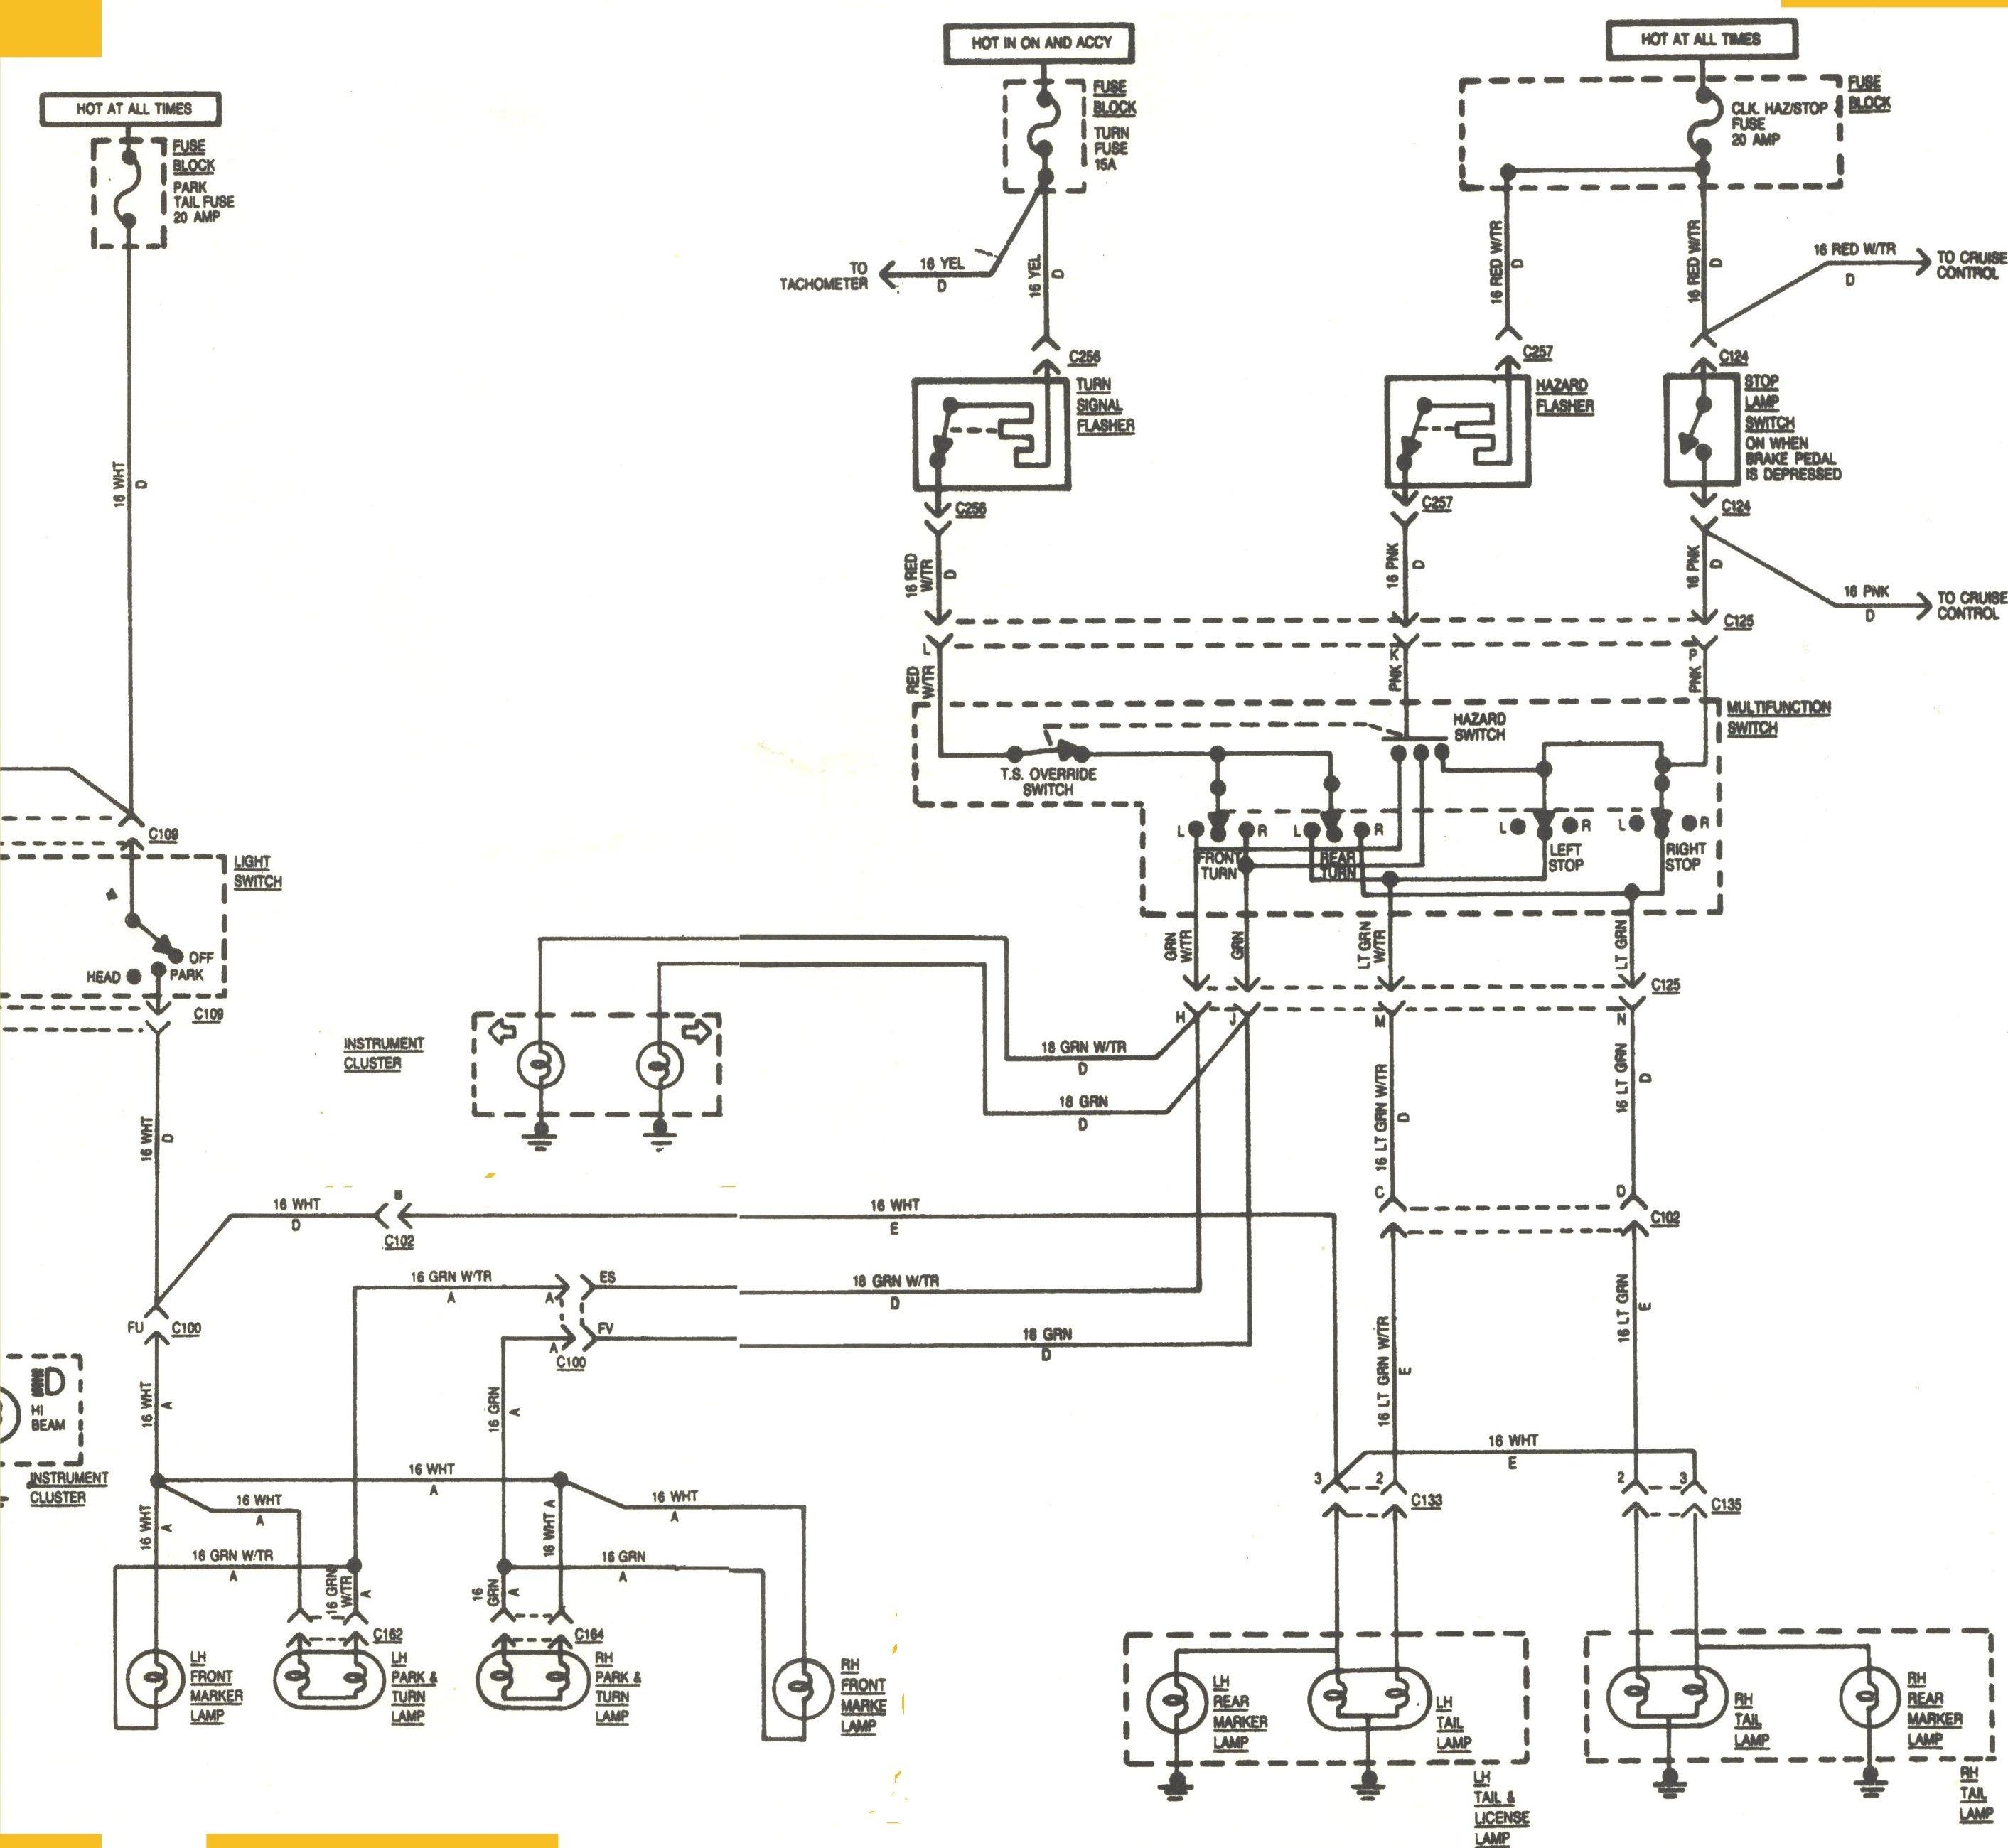 Excellent Jeep J10 Wiring Wiring Diagram Wiring Cloud Eachirenstrafr09Org